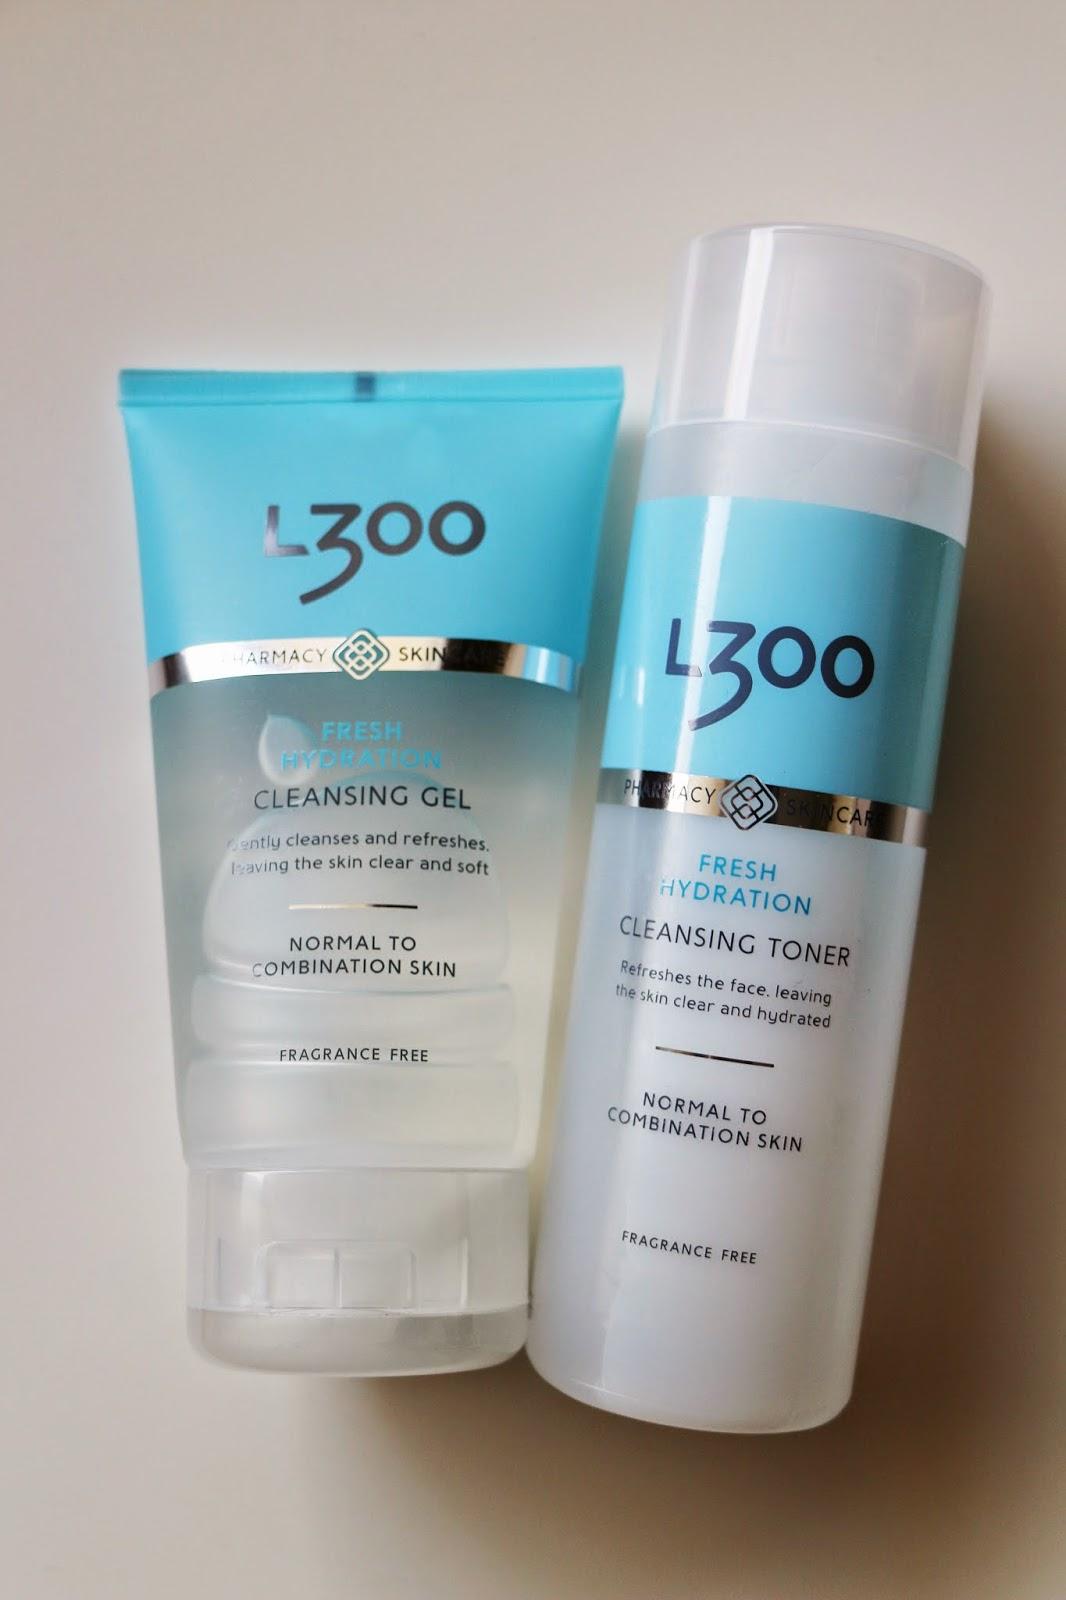 L300 cleansing gel